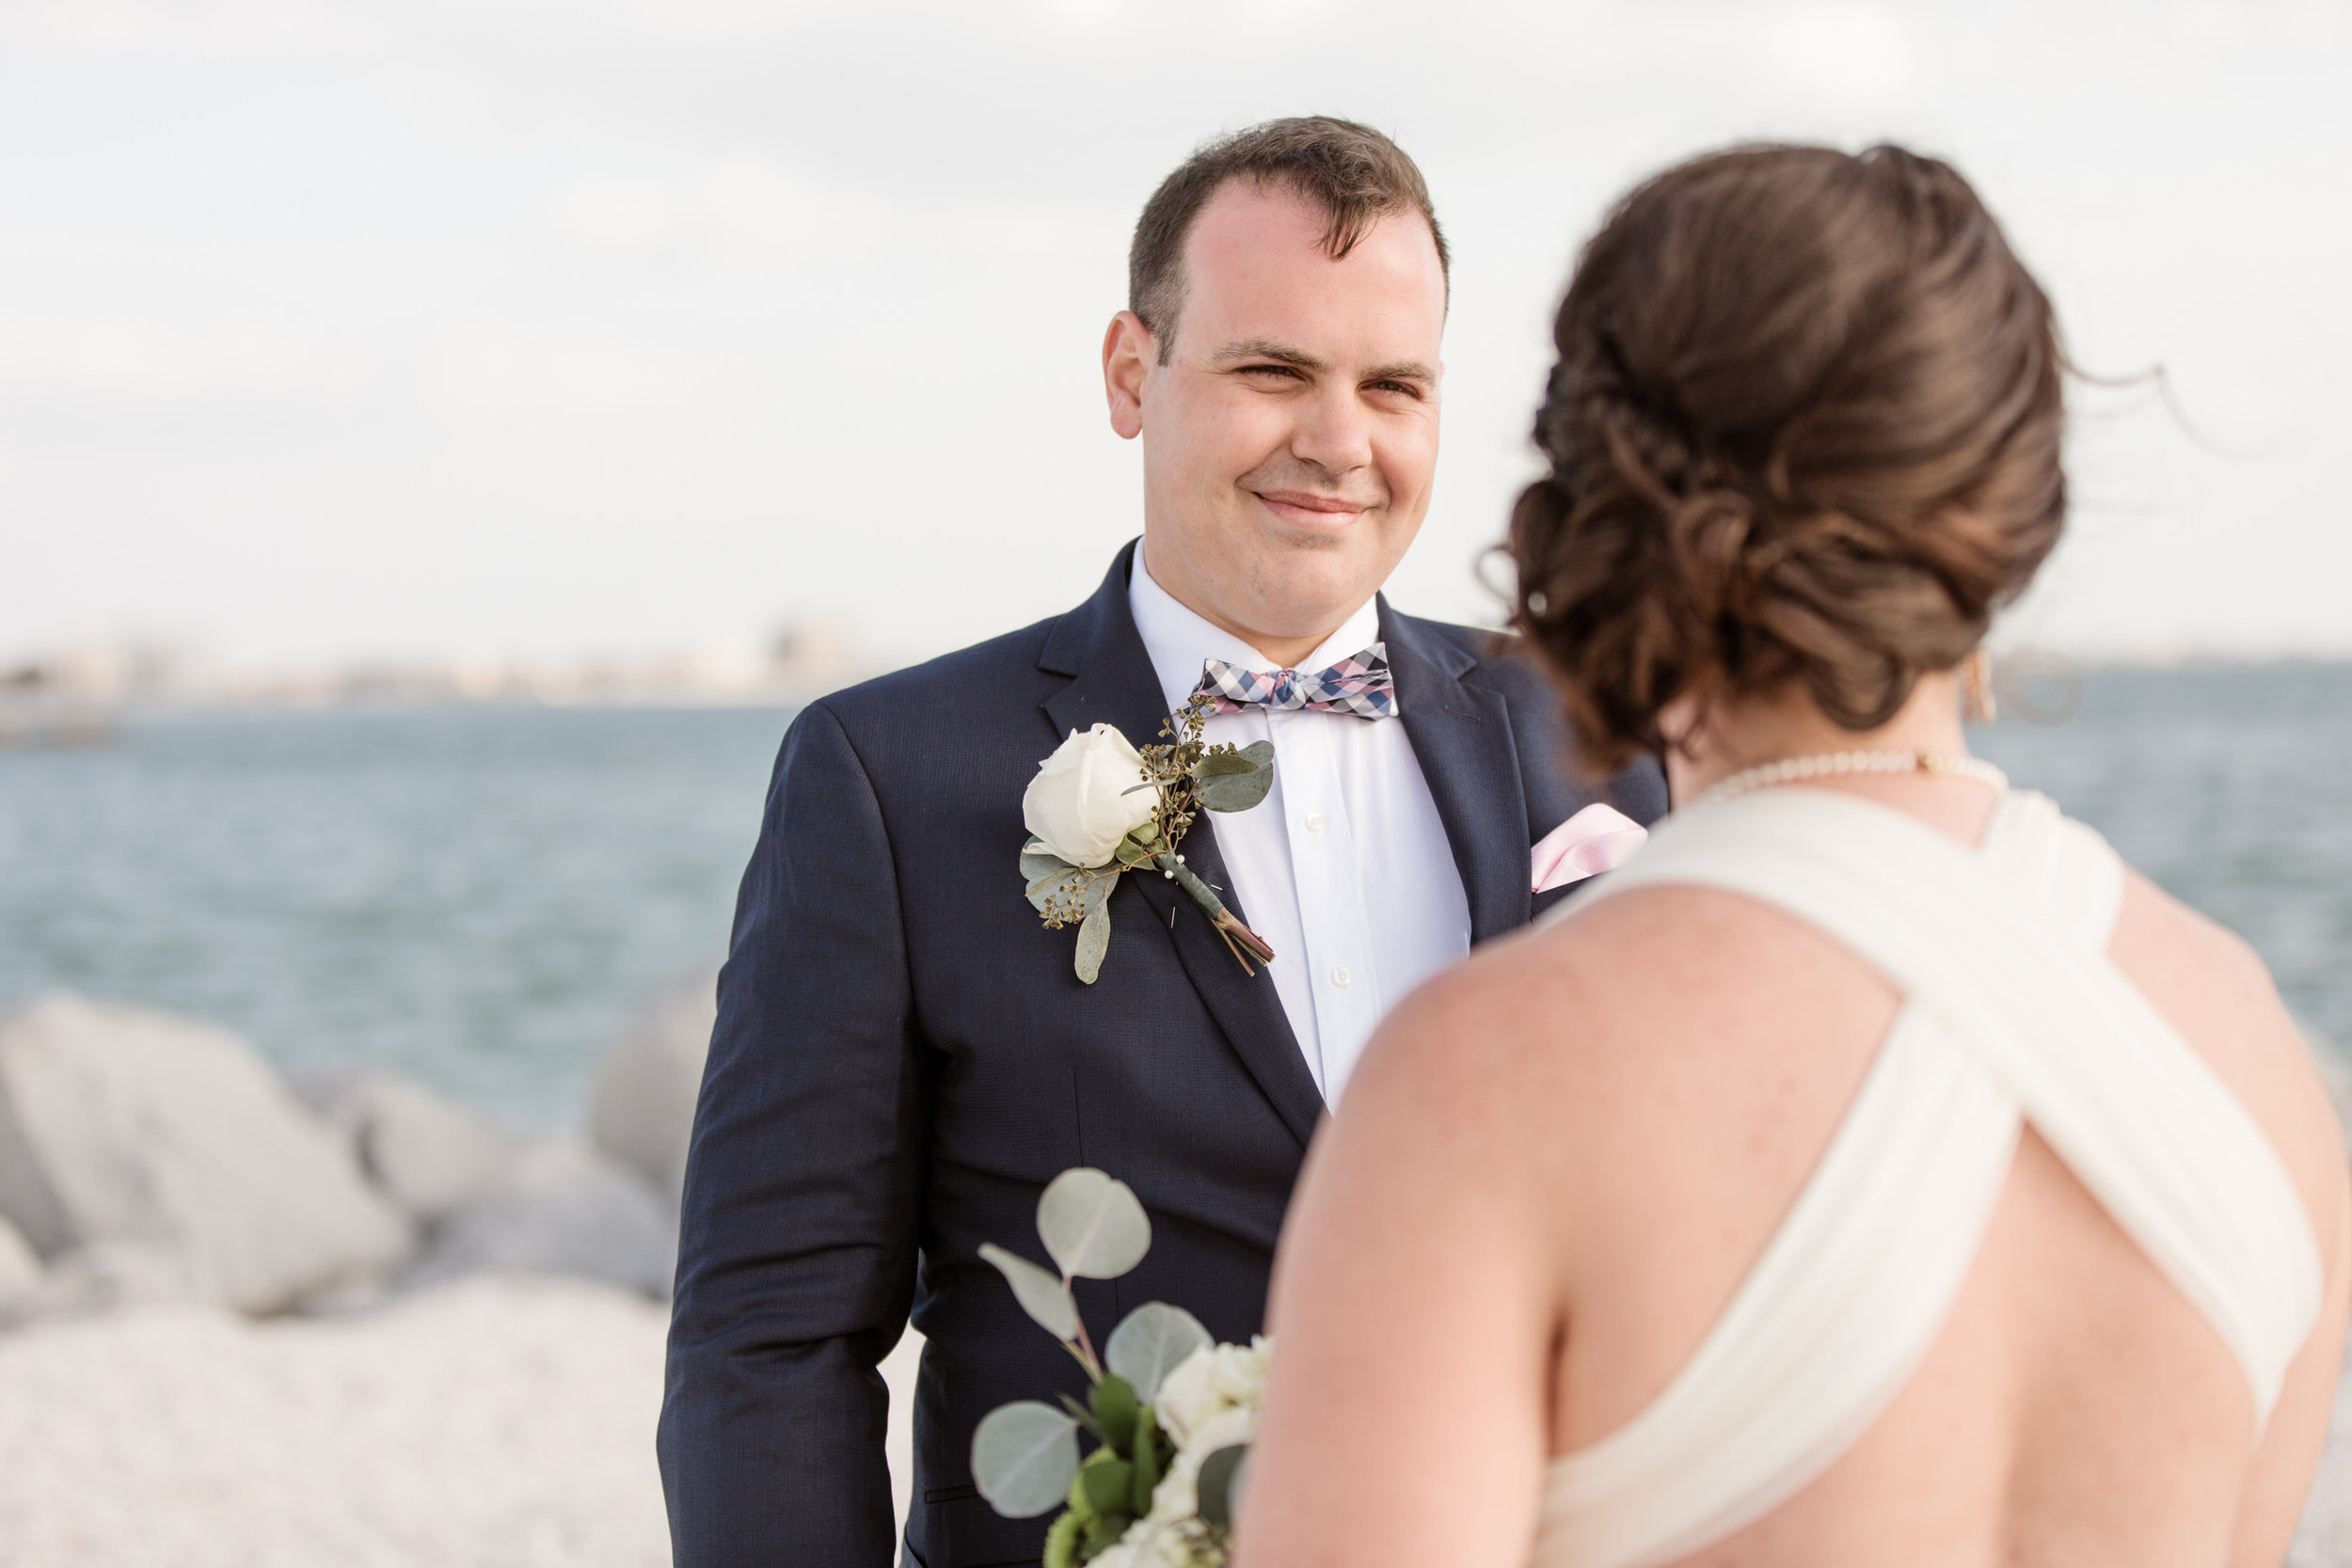 Beltran_Treasure_Island_Elopement_Tampa_Wedding_022-1.jpg